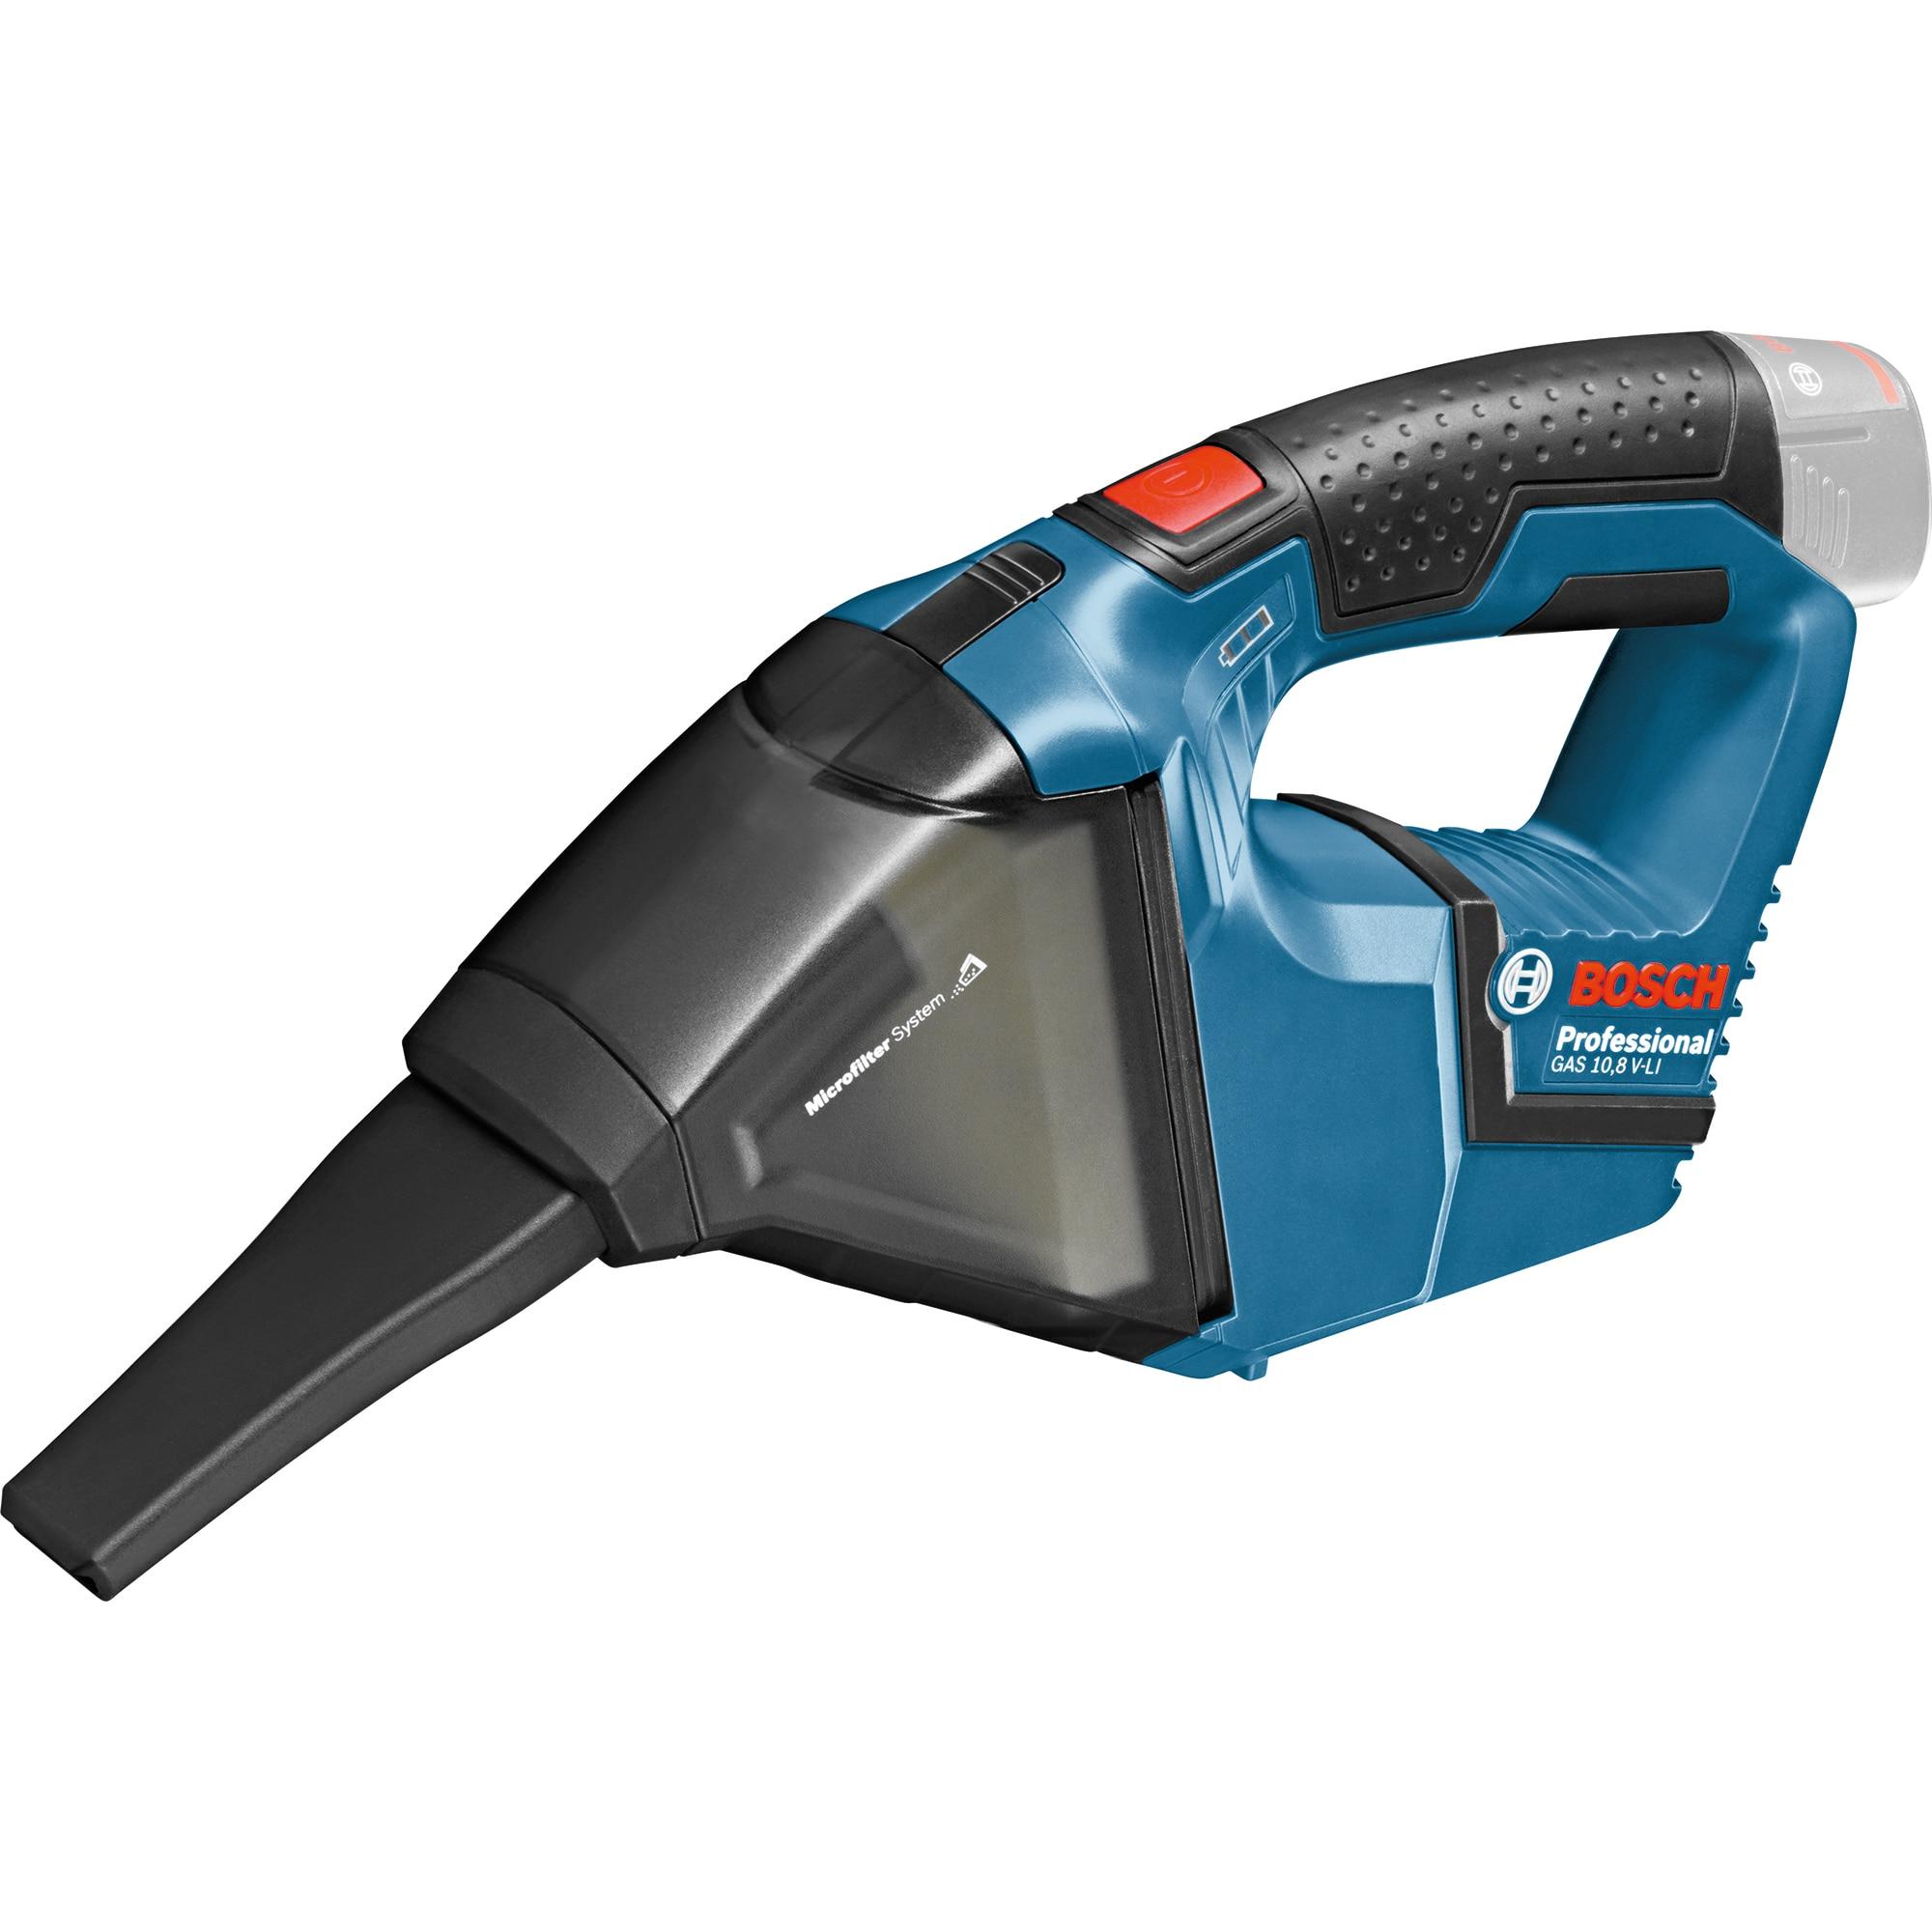 Fotografie Aspirator pe acumulator Bosch Professional GAS 12V, 12 V, 15 l/sec flux aer, 45 mbar, 408 cm² suprafata filtrare, 0.35 l volum rezervor, accesorii incluse